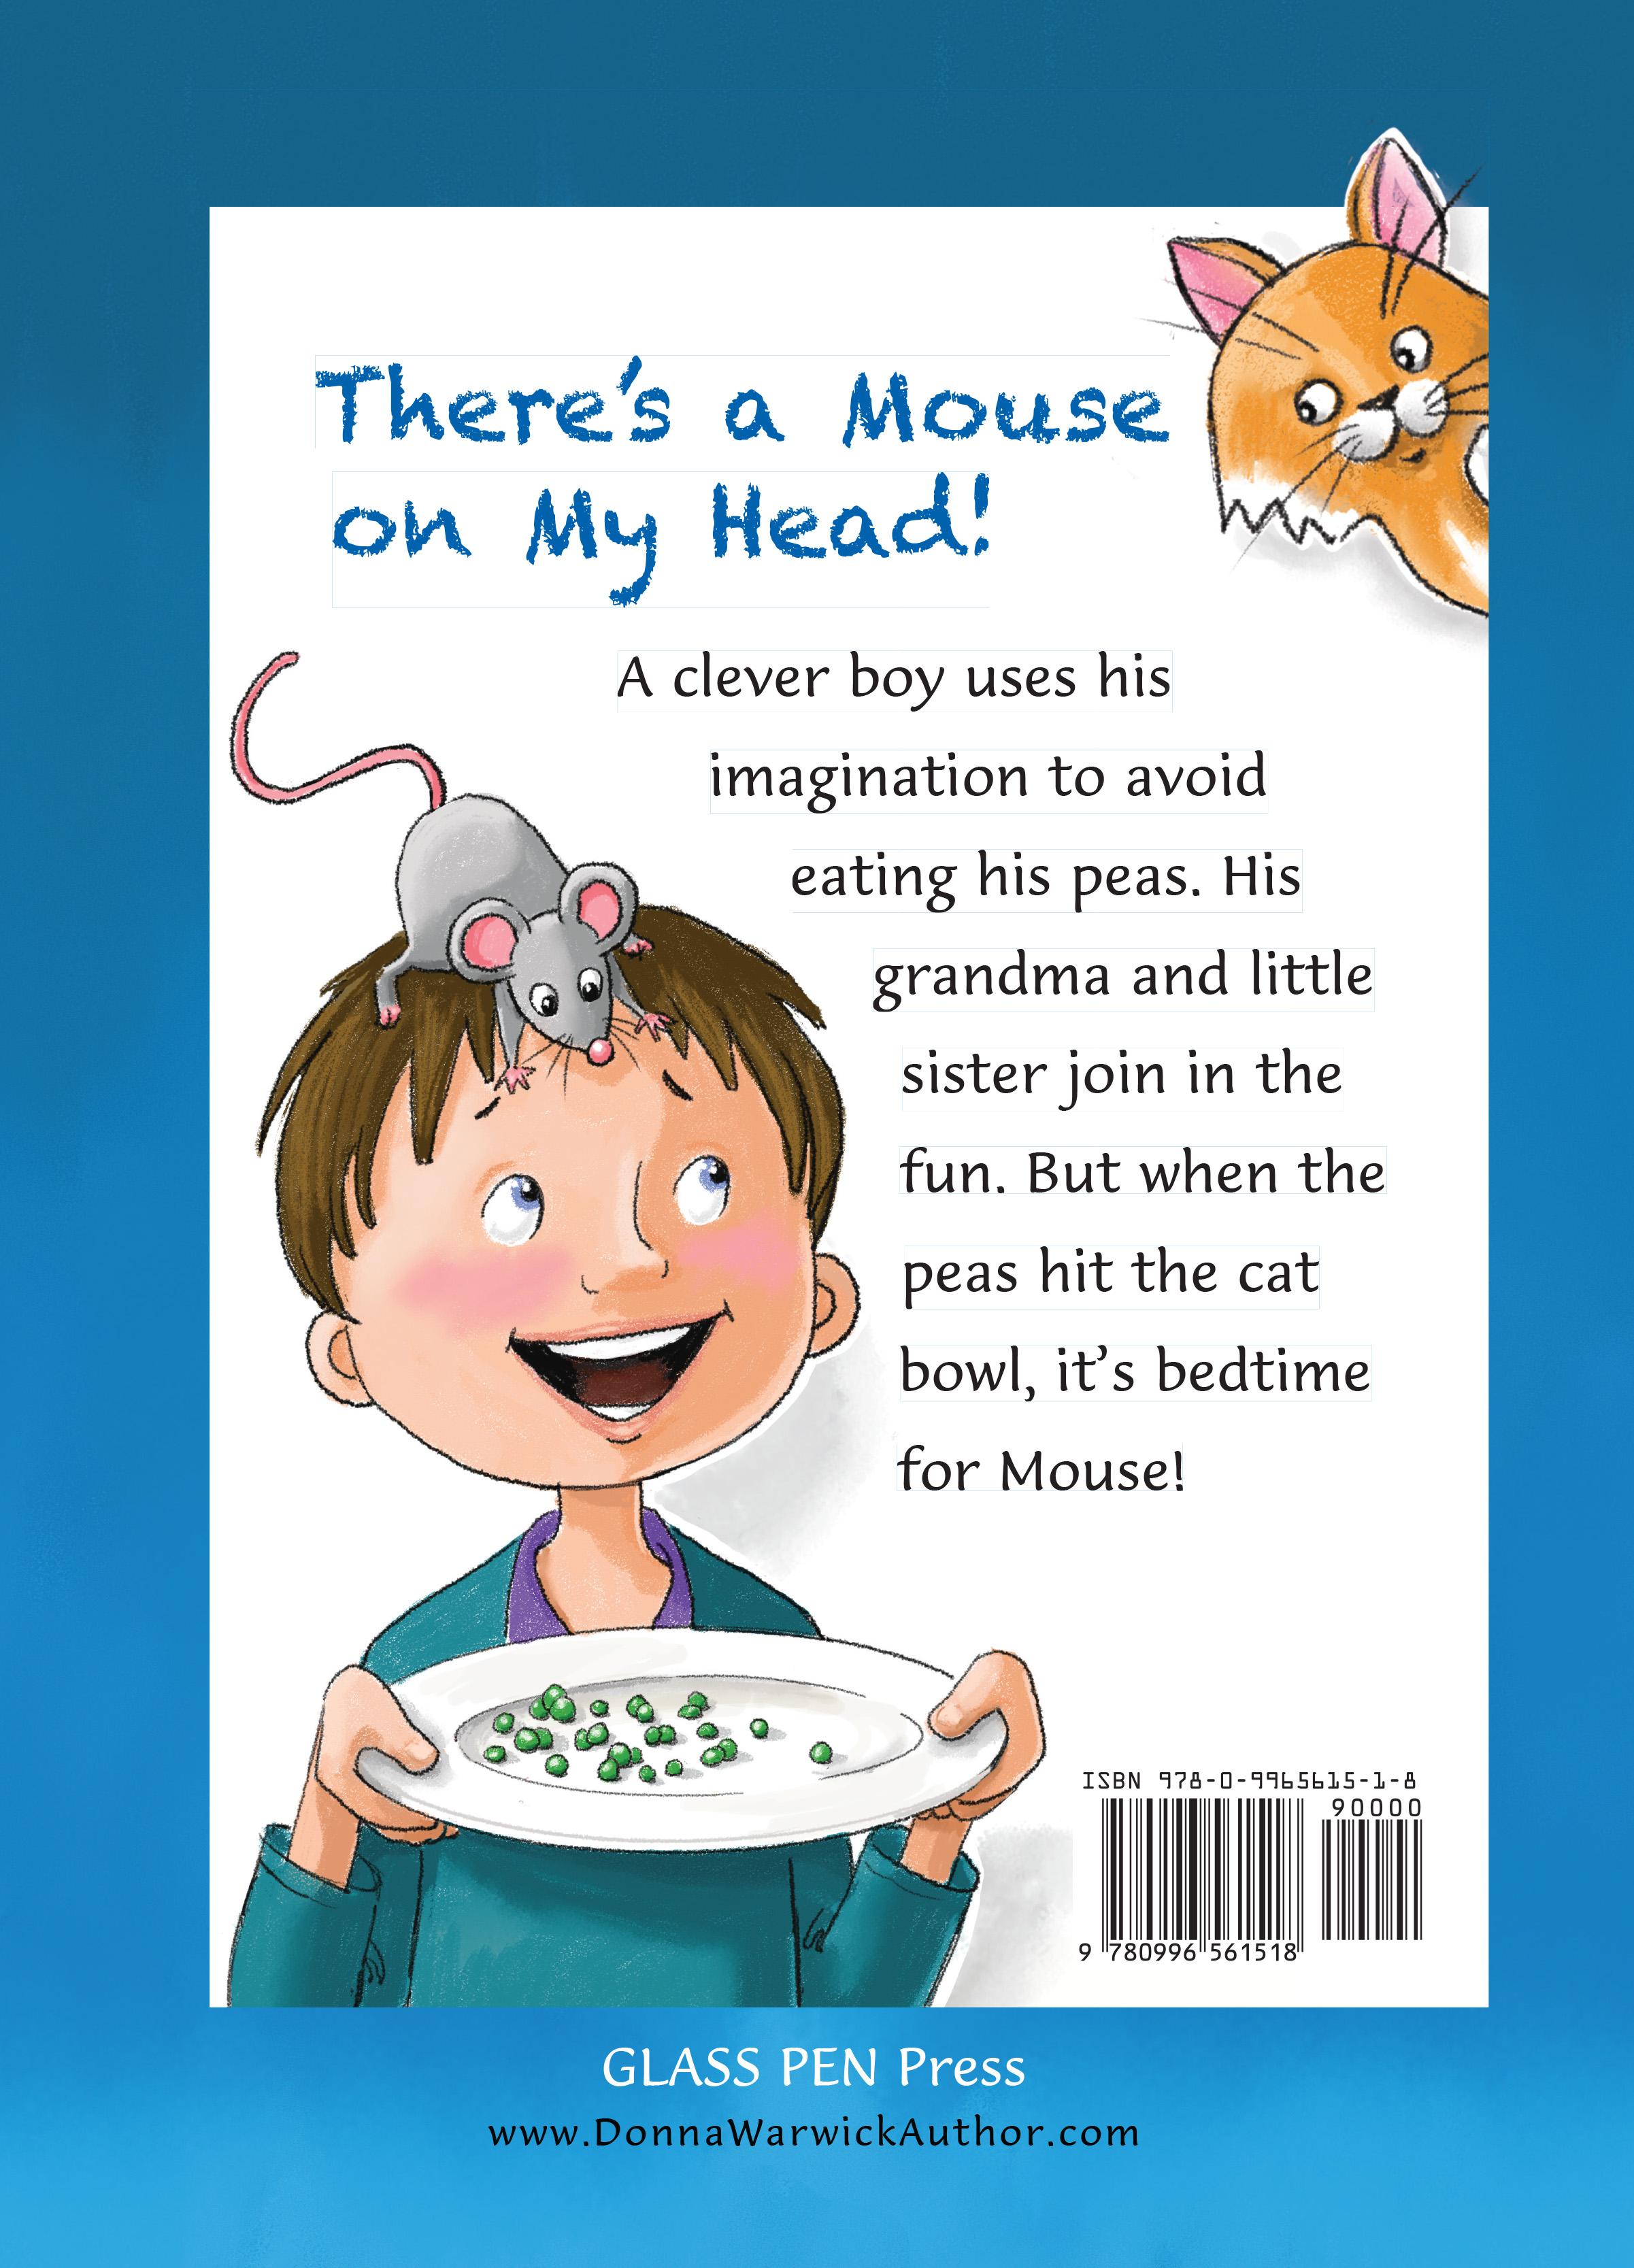 Children S Book Covers Front And Back : Children s book illustration dayne sislen